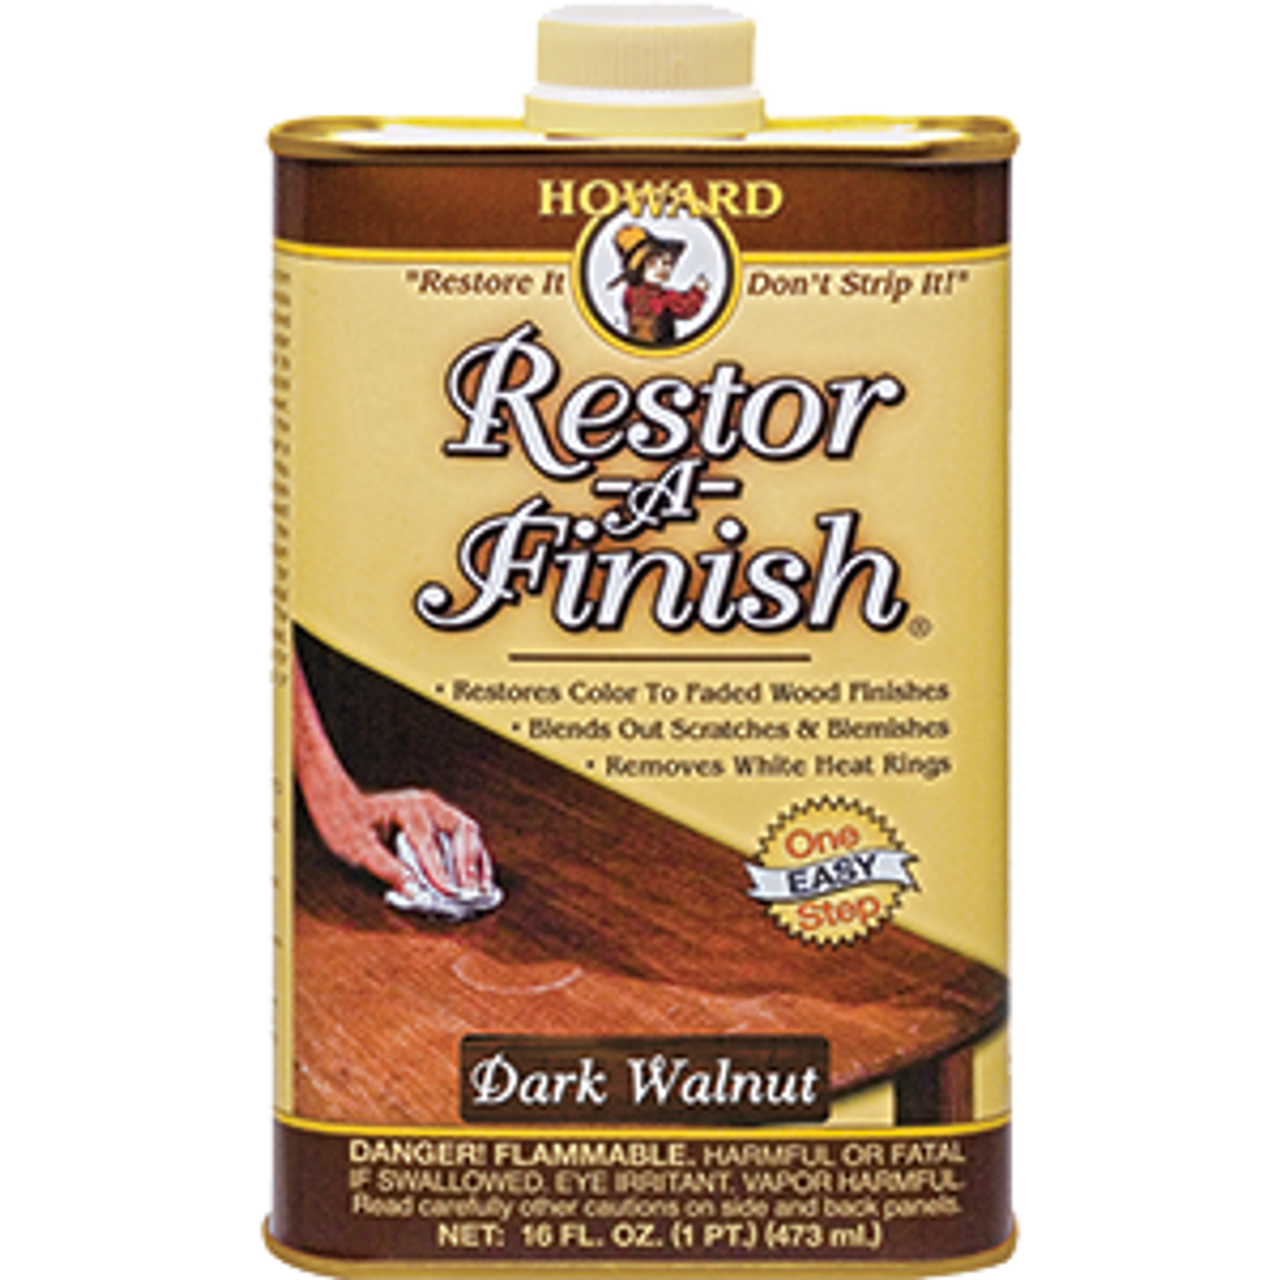 HOWARD RF6016 16OZ DARK WALNUT RESTOR-A-FINISH